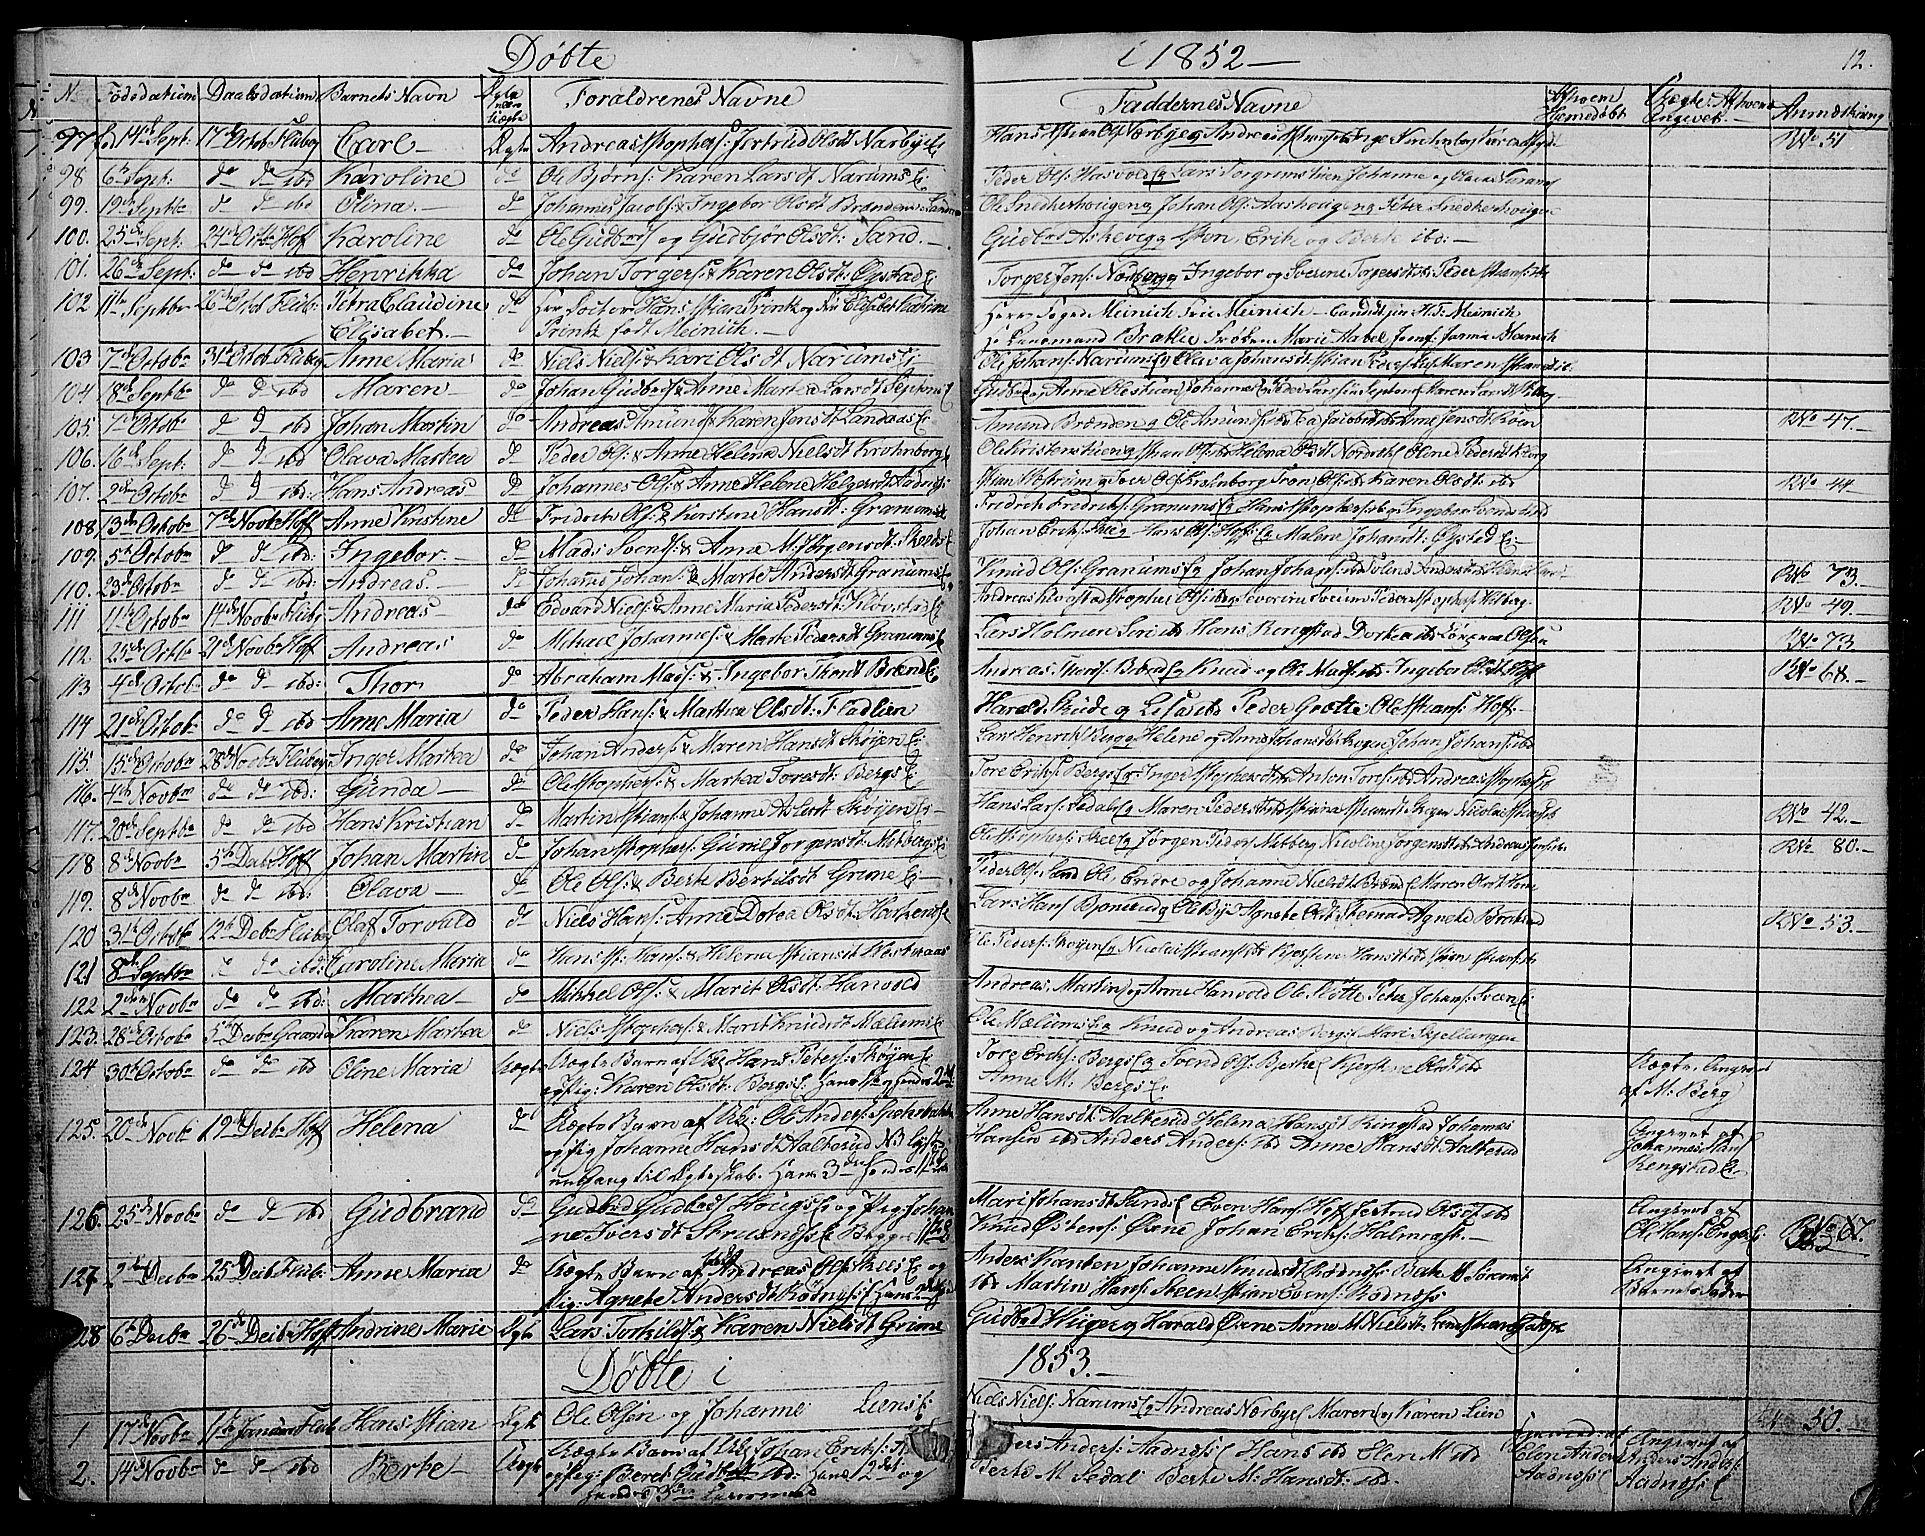 SAH, Søndre Land prestekontor, L/L0001: Klokkerbok nr. 1, 1849-1883, s. 12